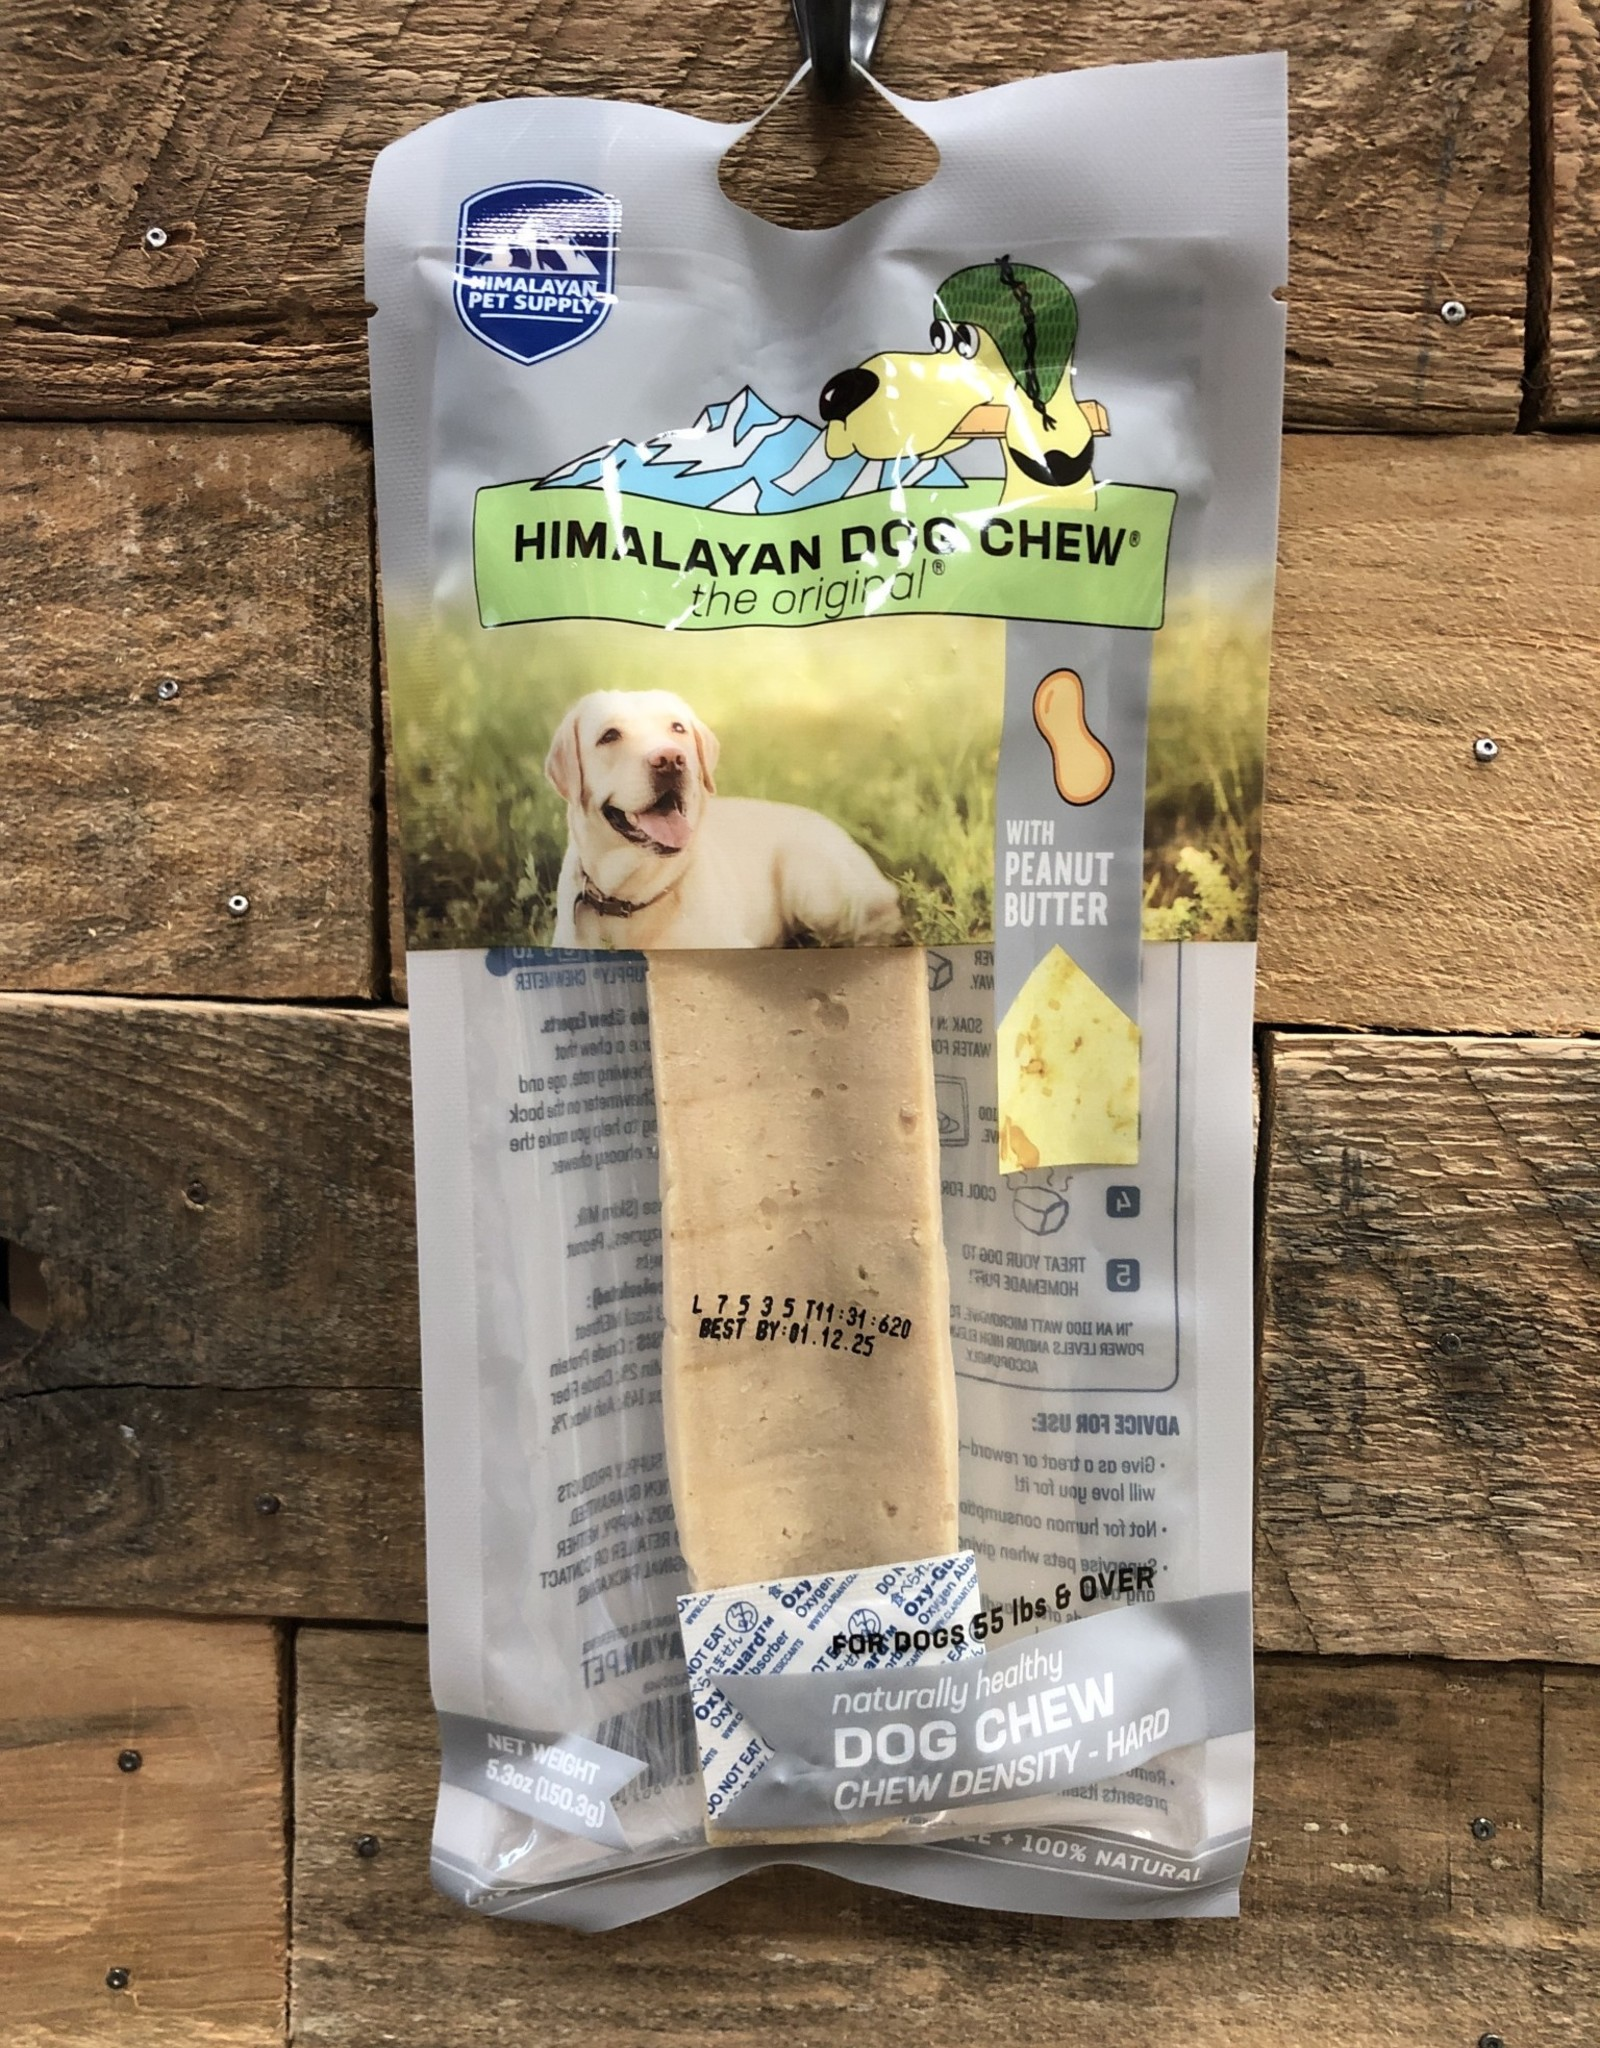 Himalayan Dog Chew Himalayan Dog Peanut Butter XLG 5.3OZ